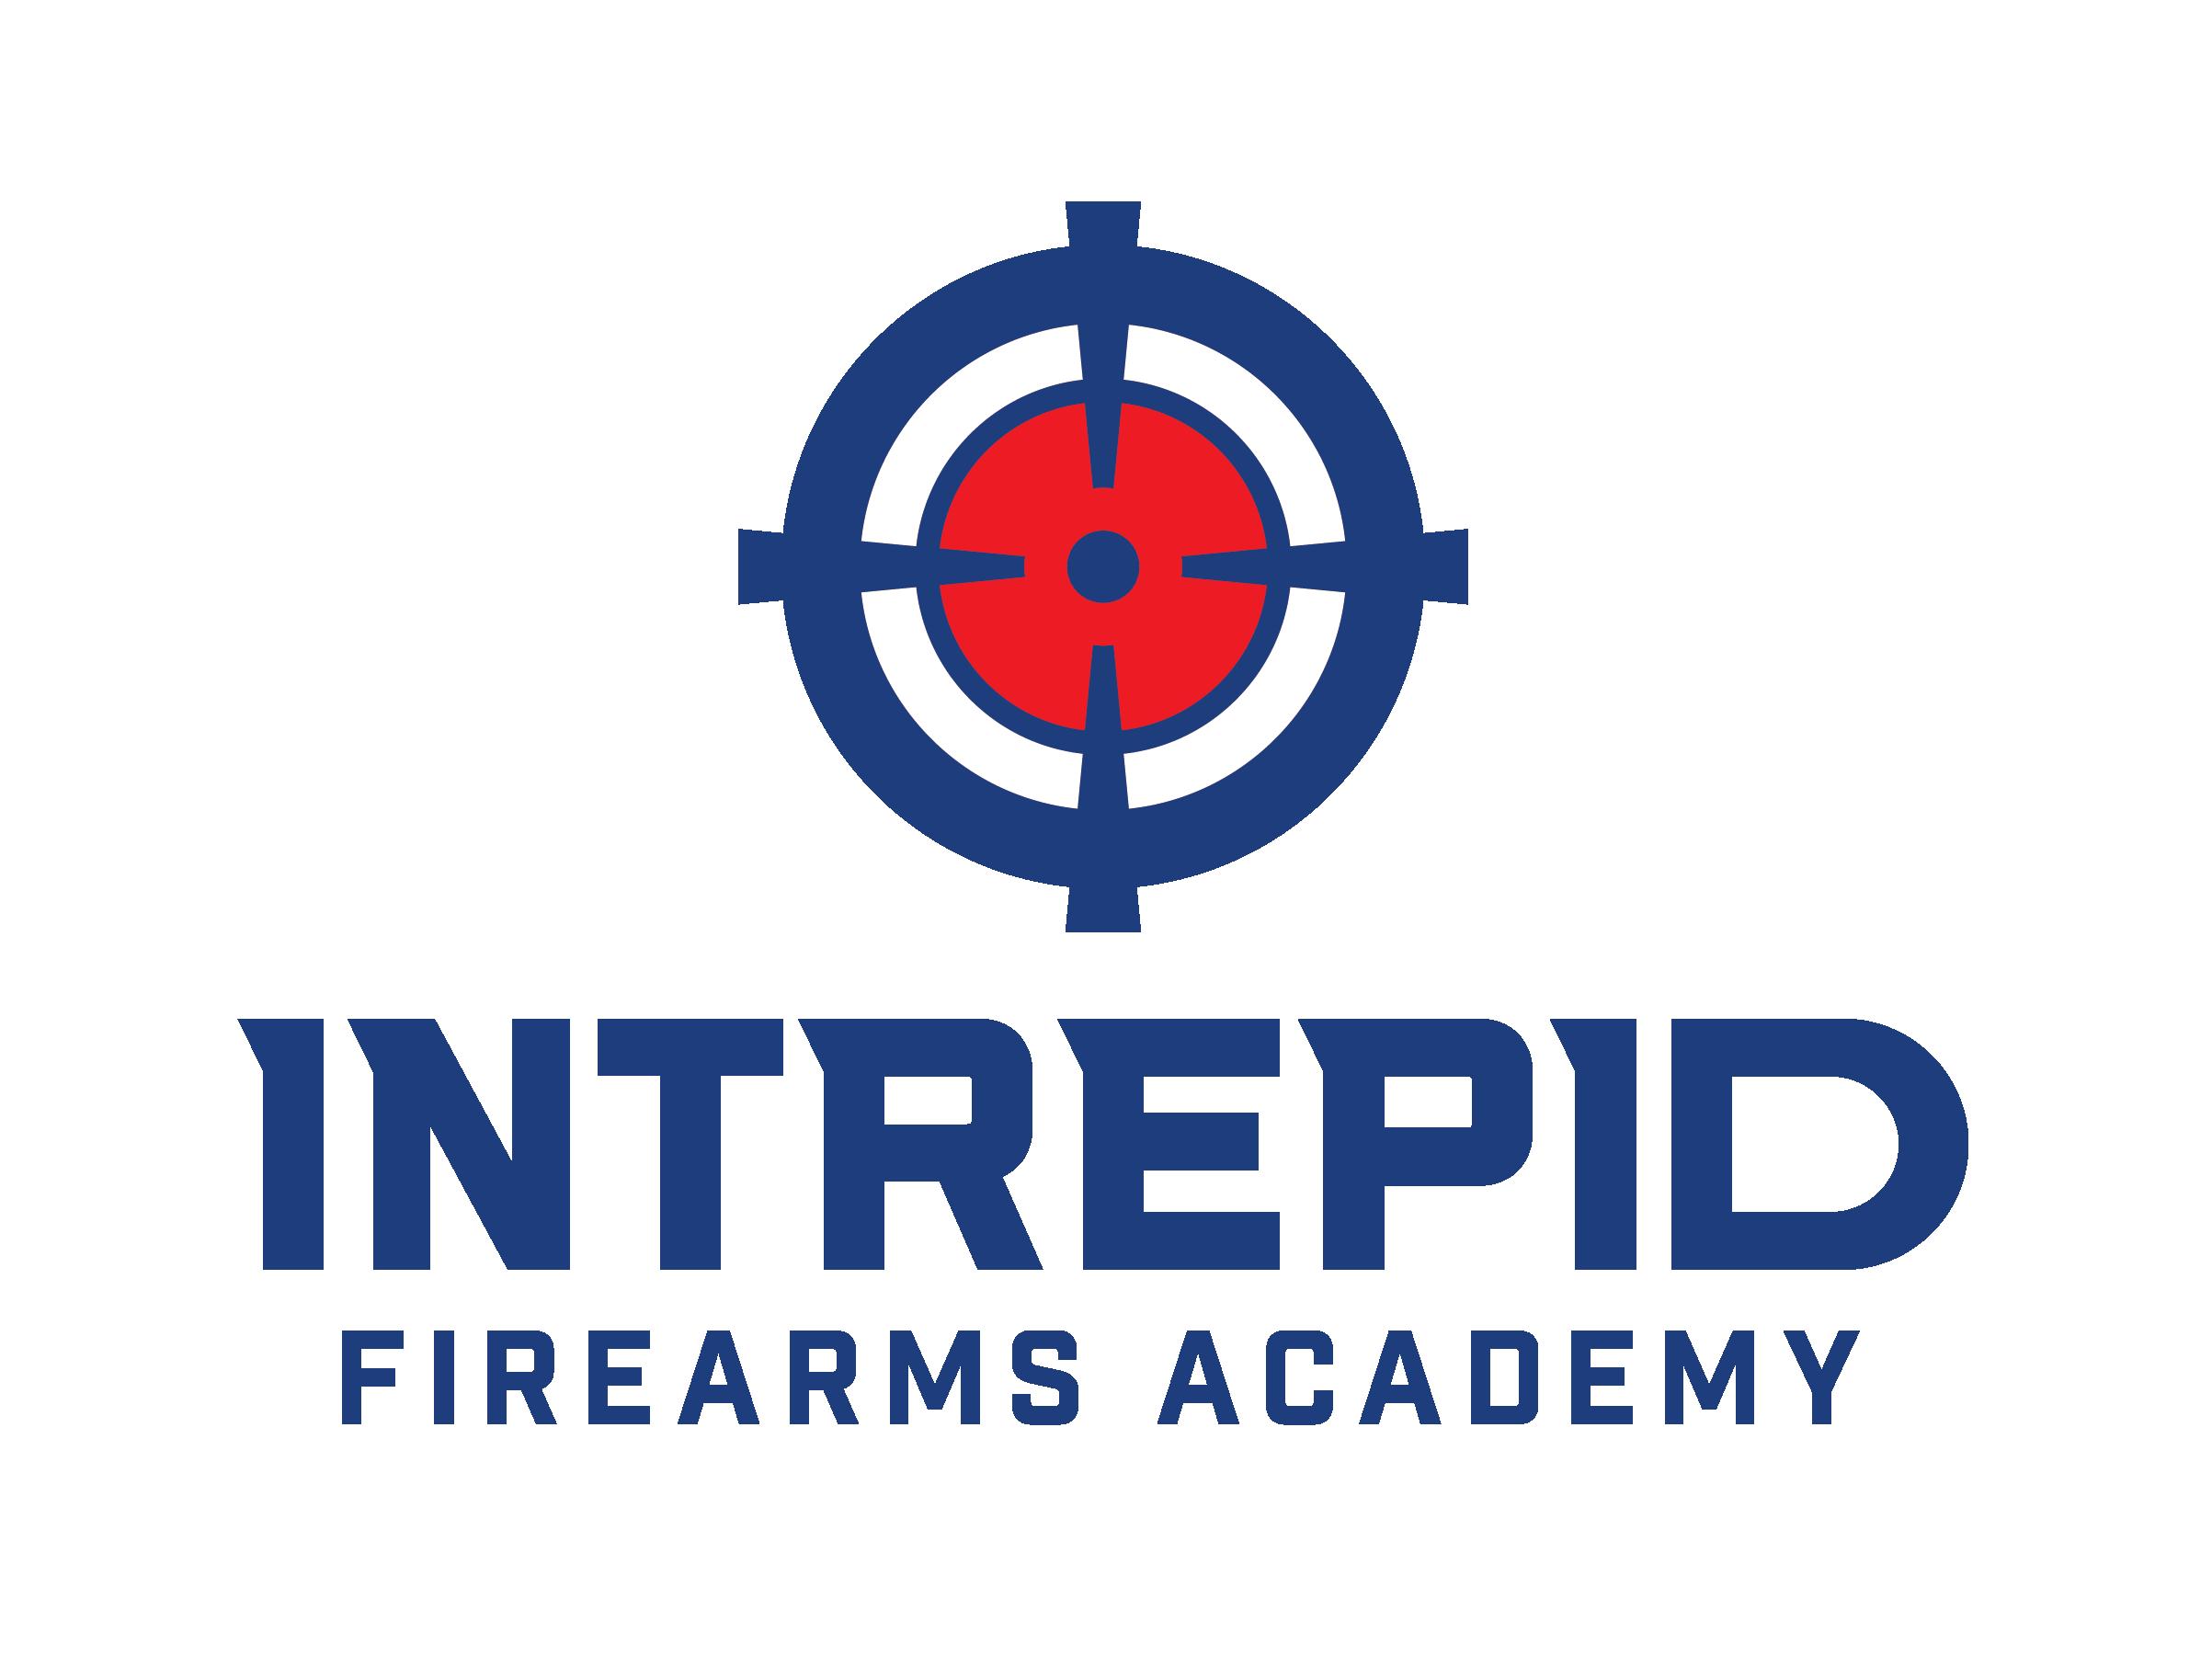 Intrepid Firearms Academy